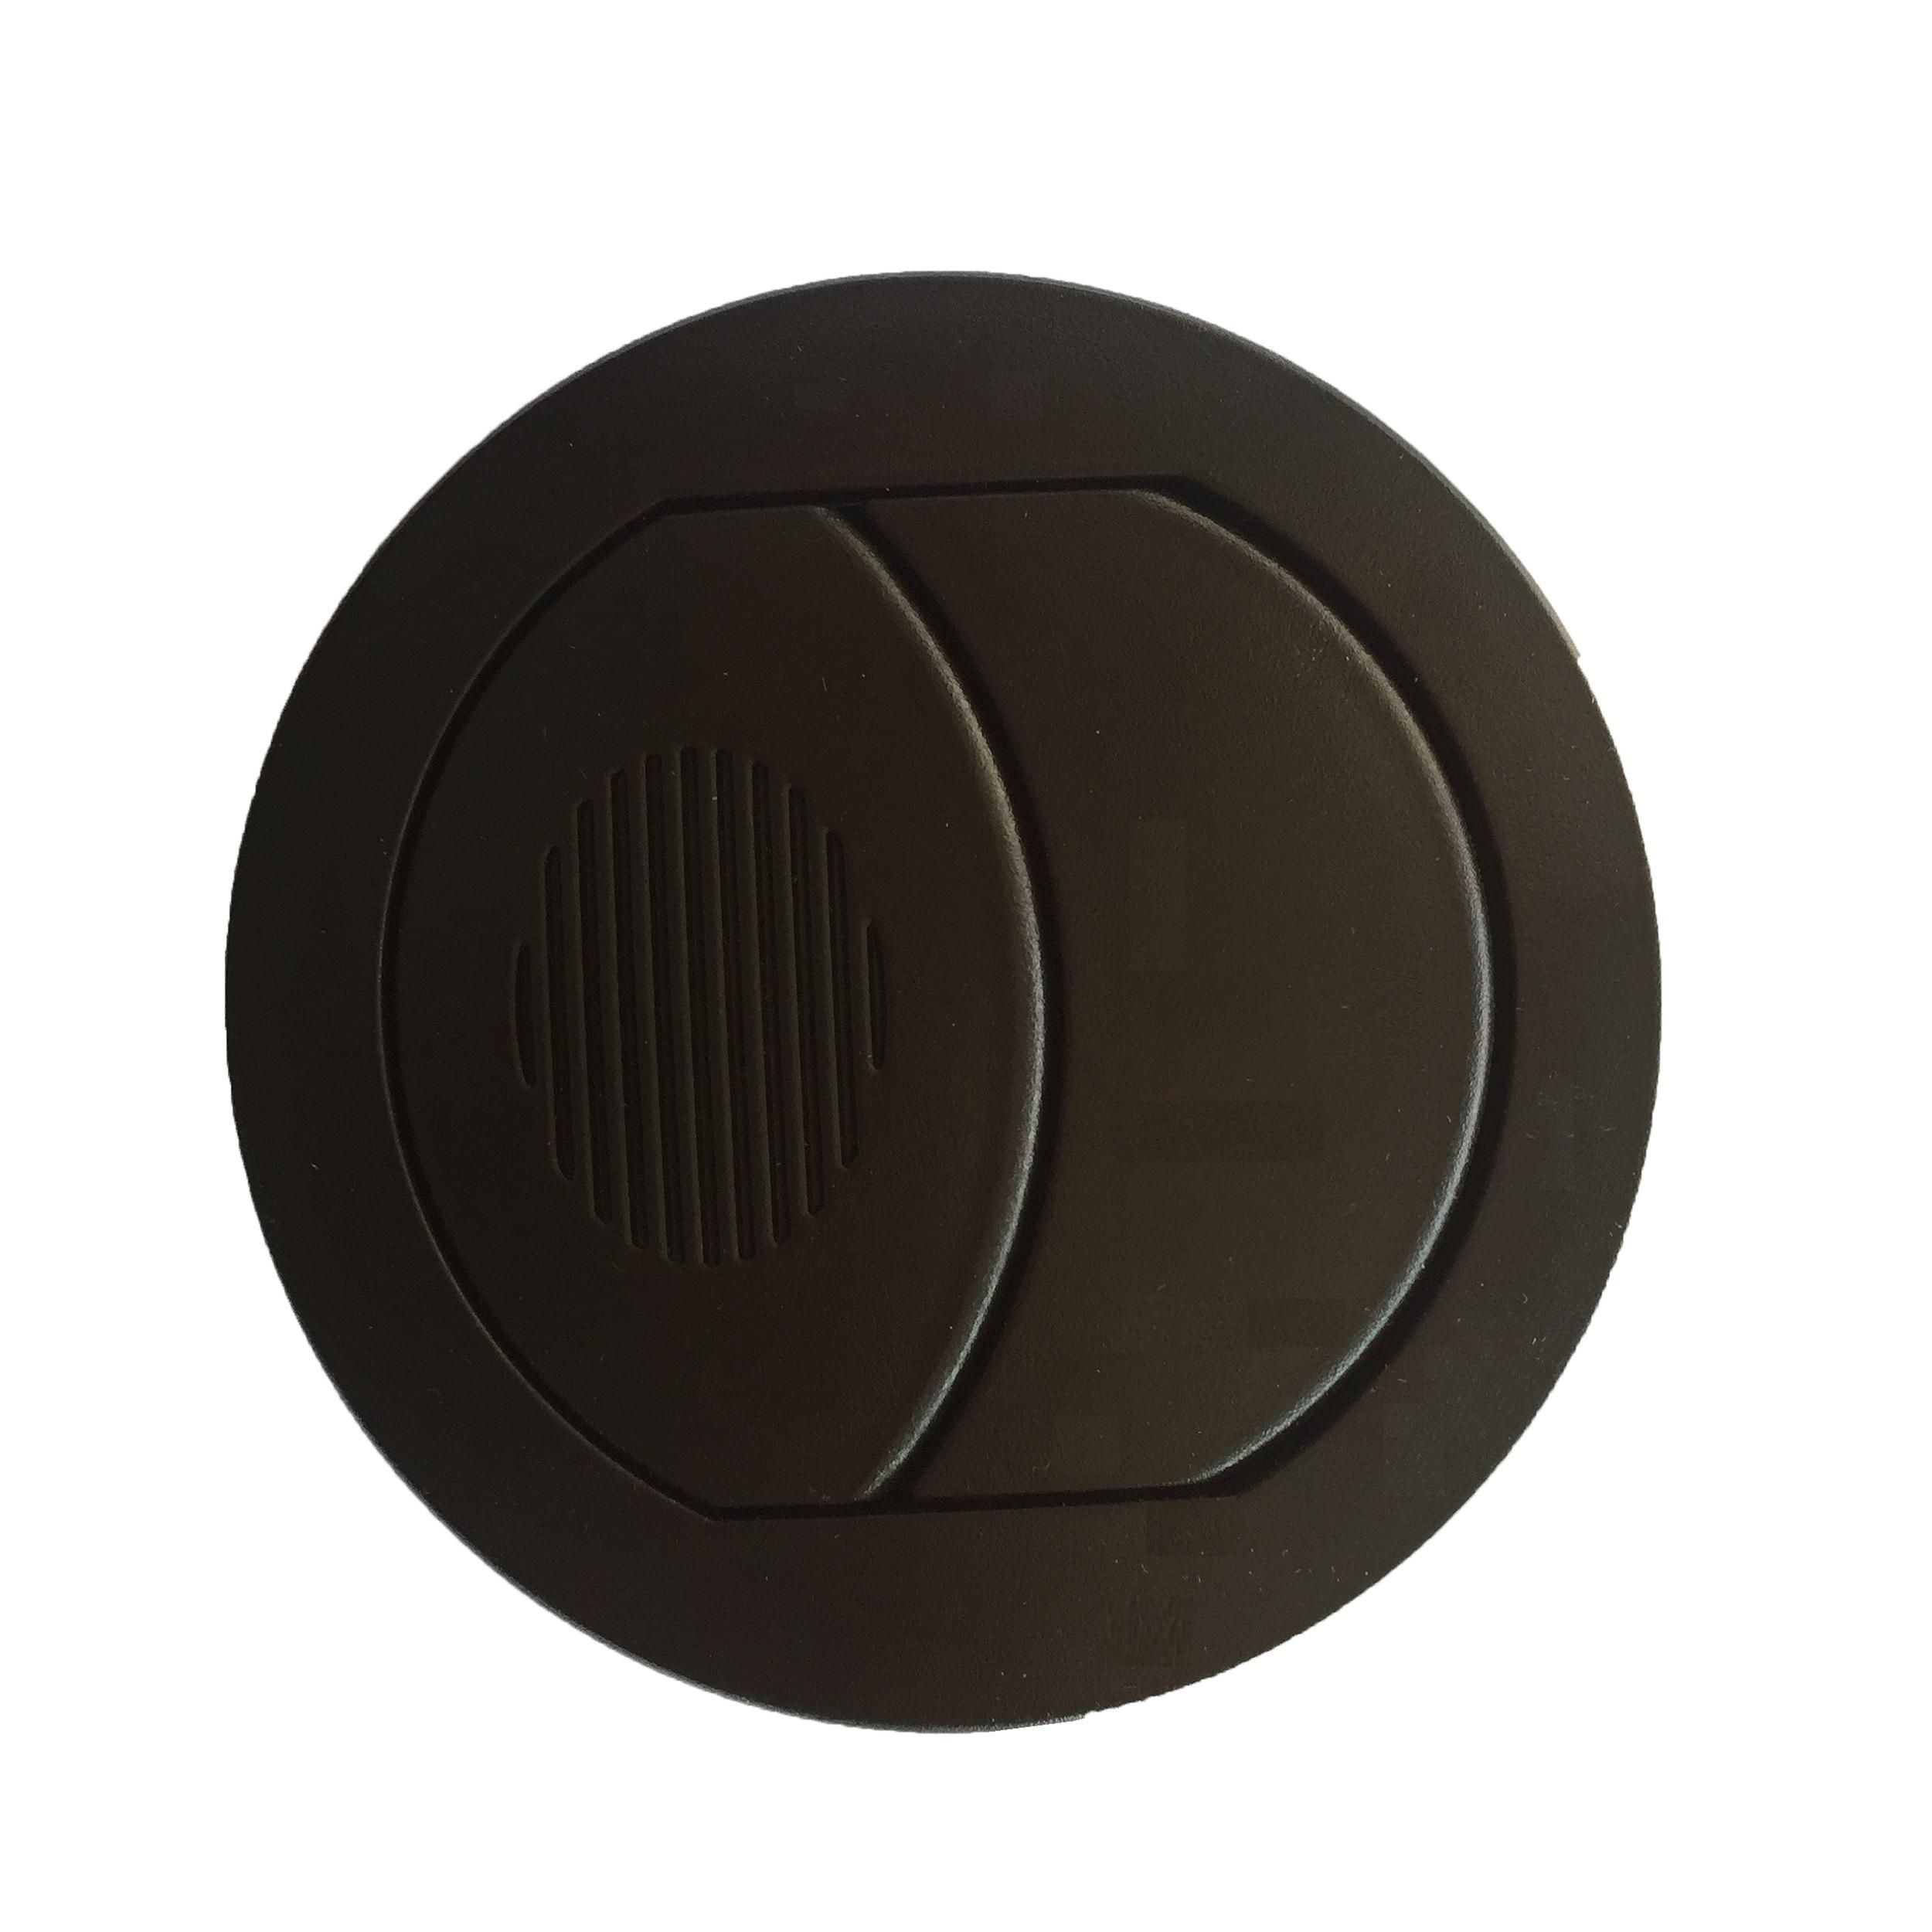 خرید                     قاب تهویه داشبورد آرپیکو کد 2515 مناسب برای پراید